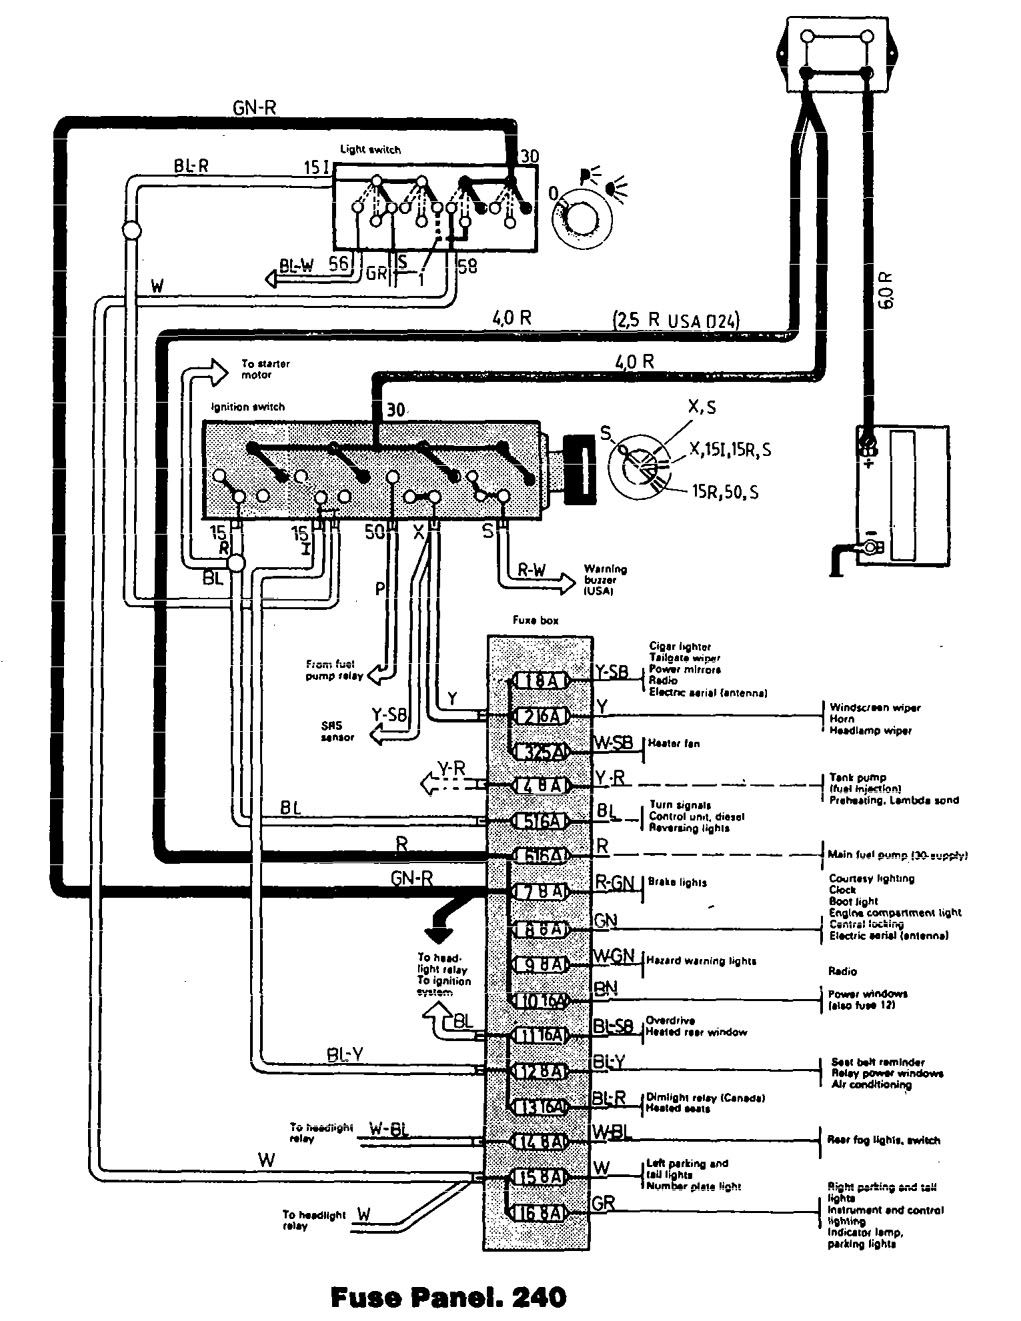 Tremendous 1992 Volvo Fuse Box Wiring Diagram Data Schema Wiring Cloud Mousmenurrecoveryedborg